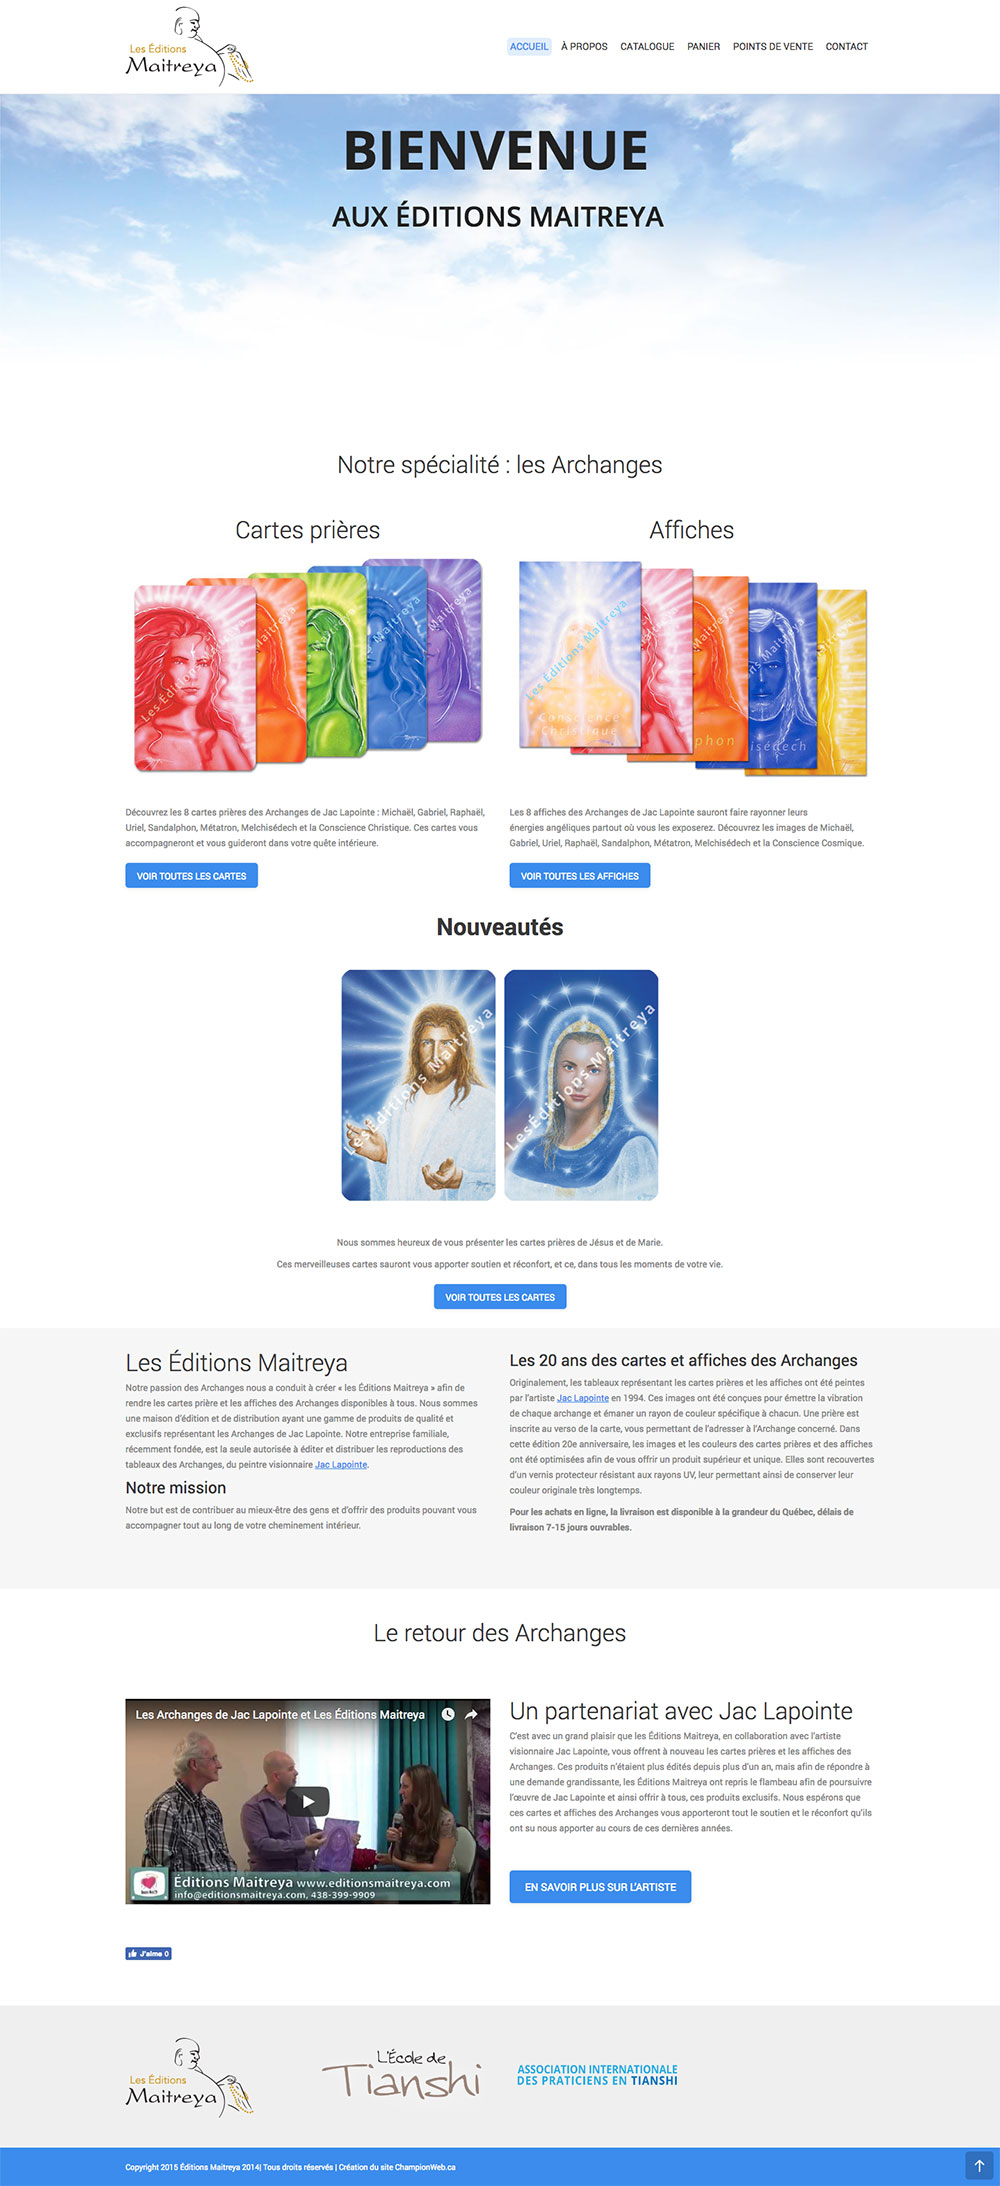 Editions Maitreya